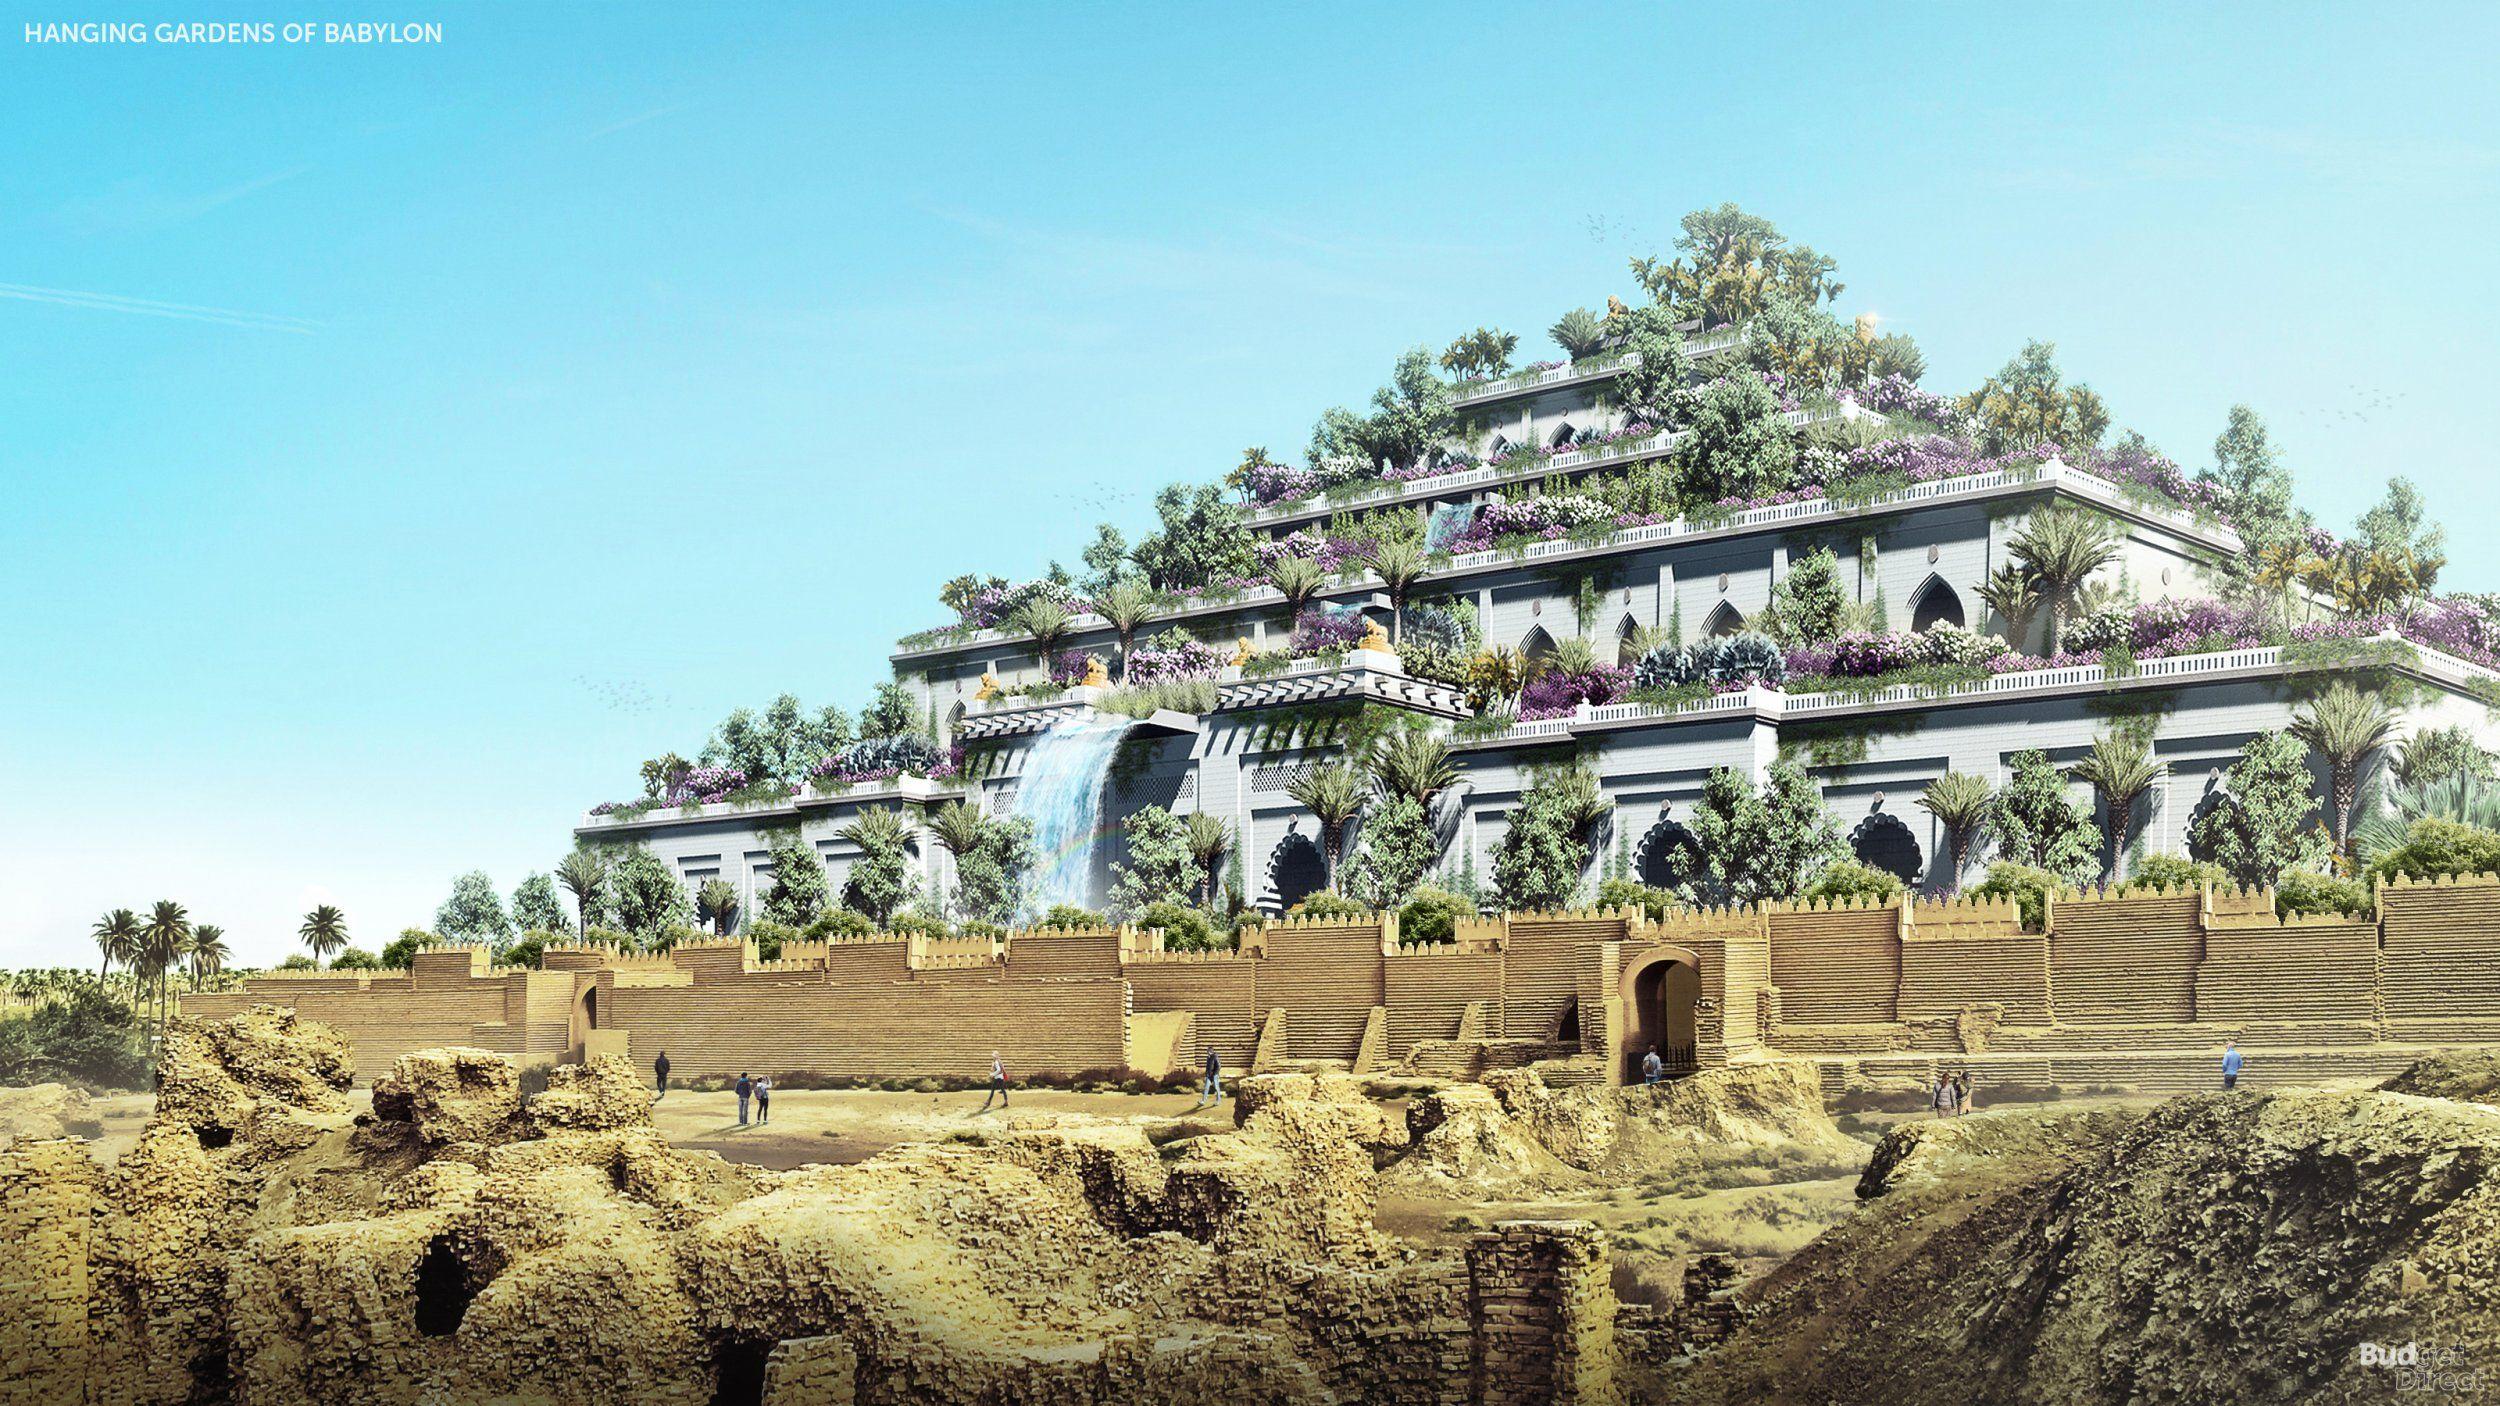 d9ee75c22136e78b06b042e30e881395 - Hanging Gardens Of Babylon Images Now